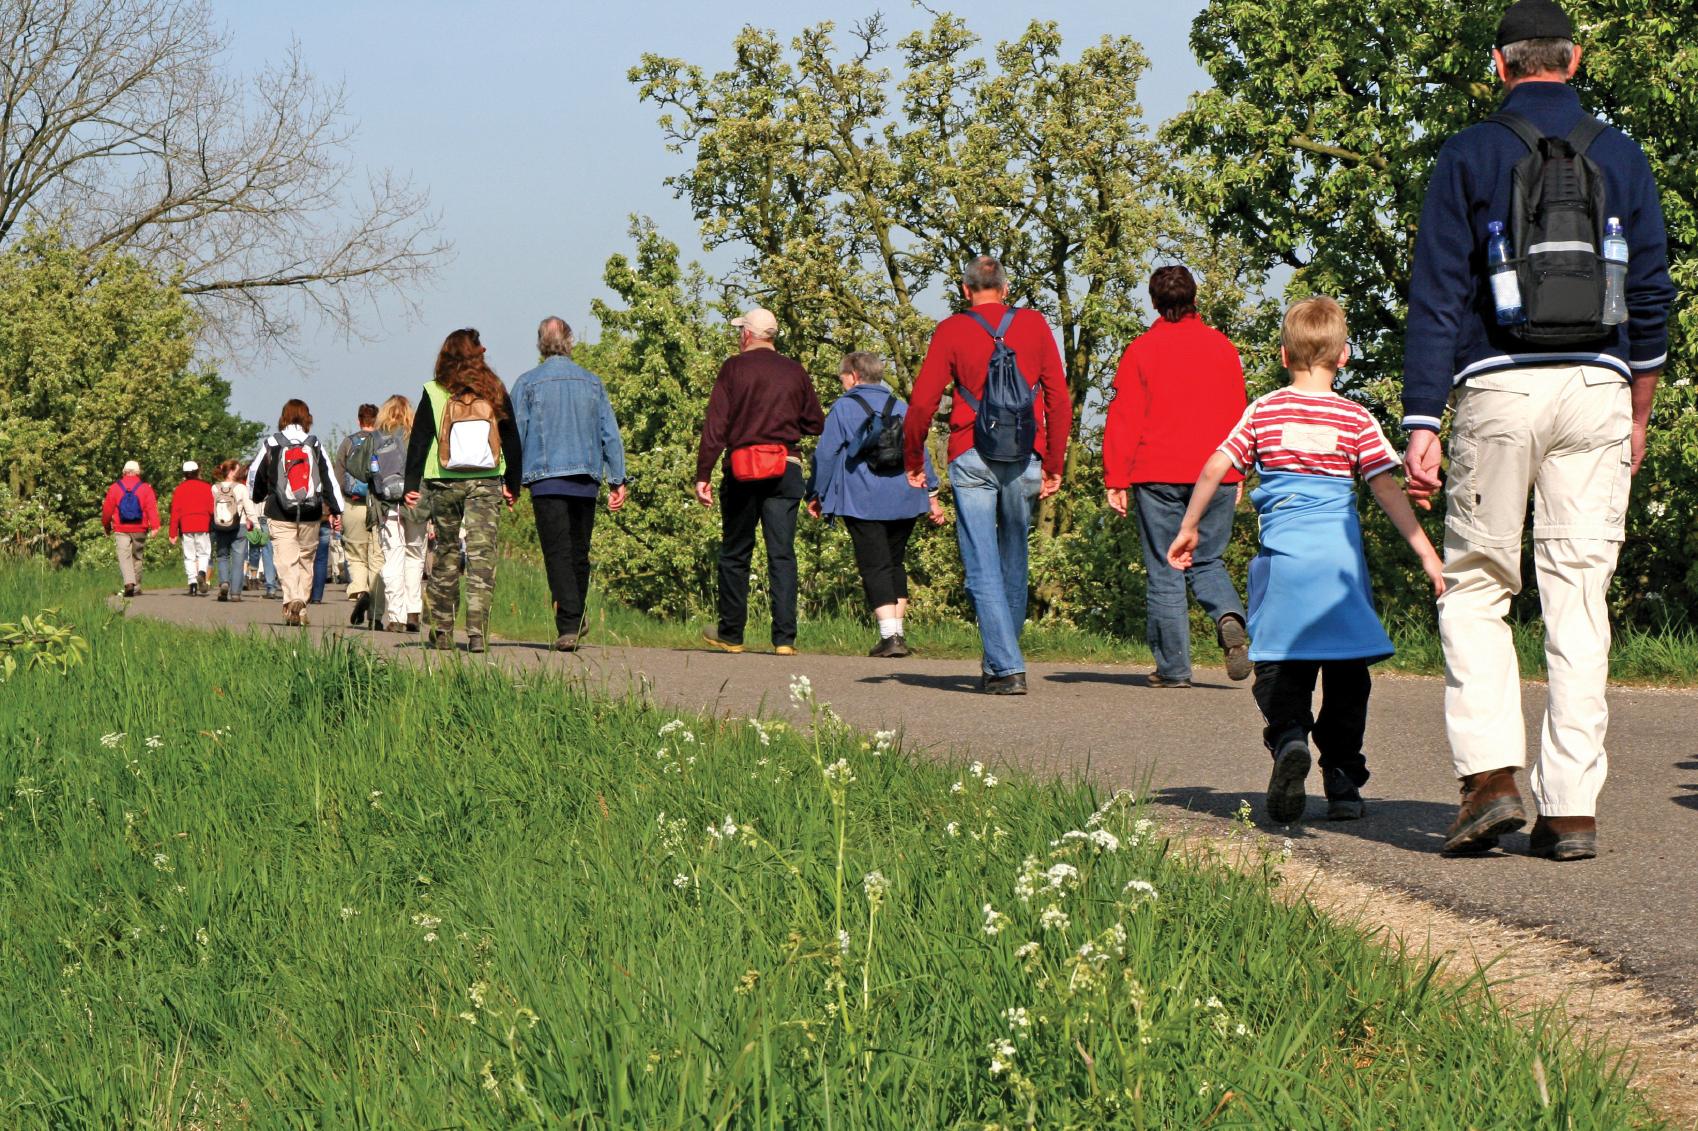 walking health benefits community